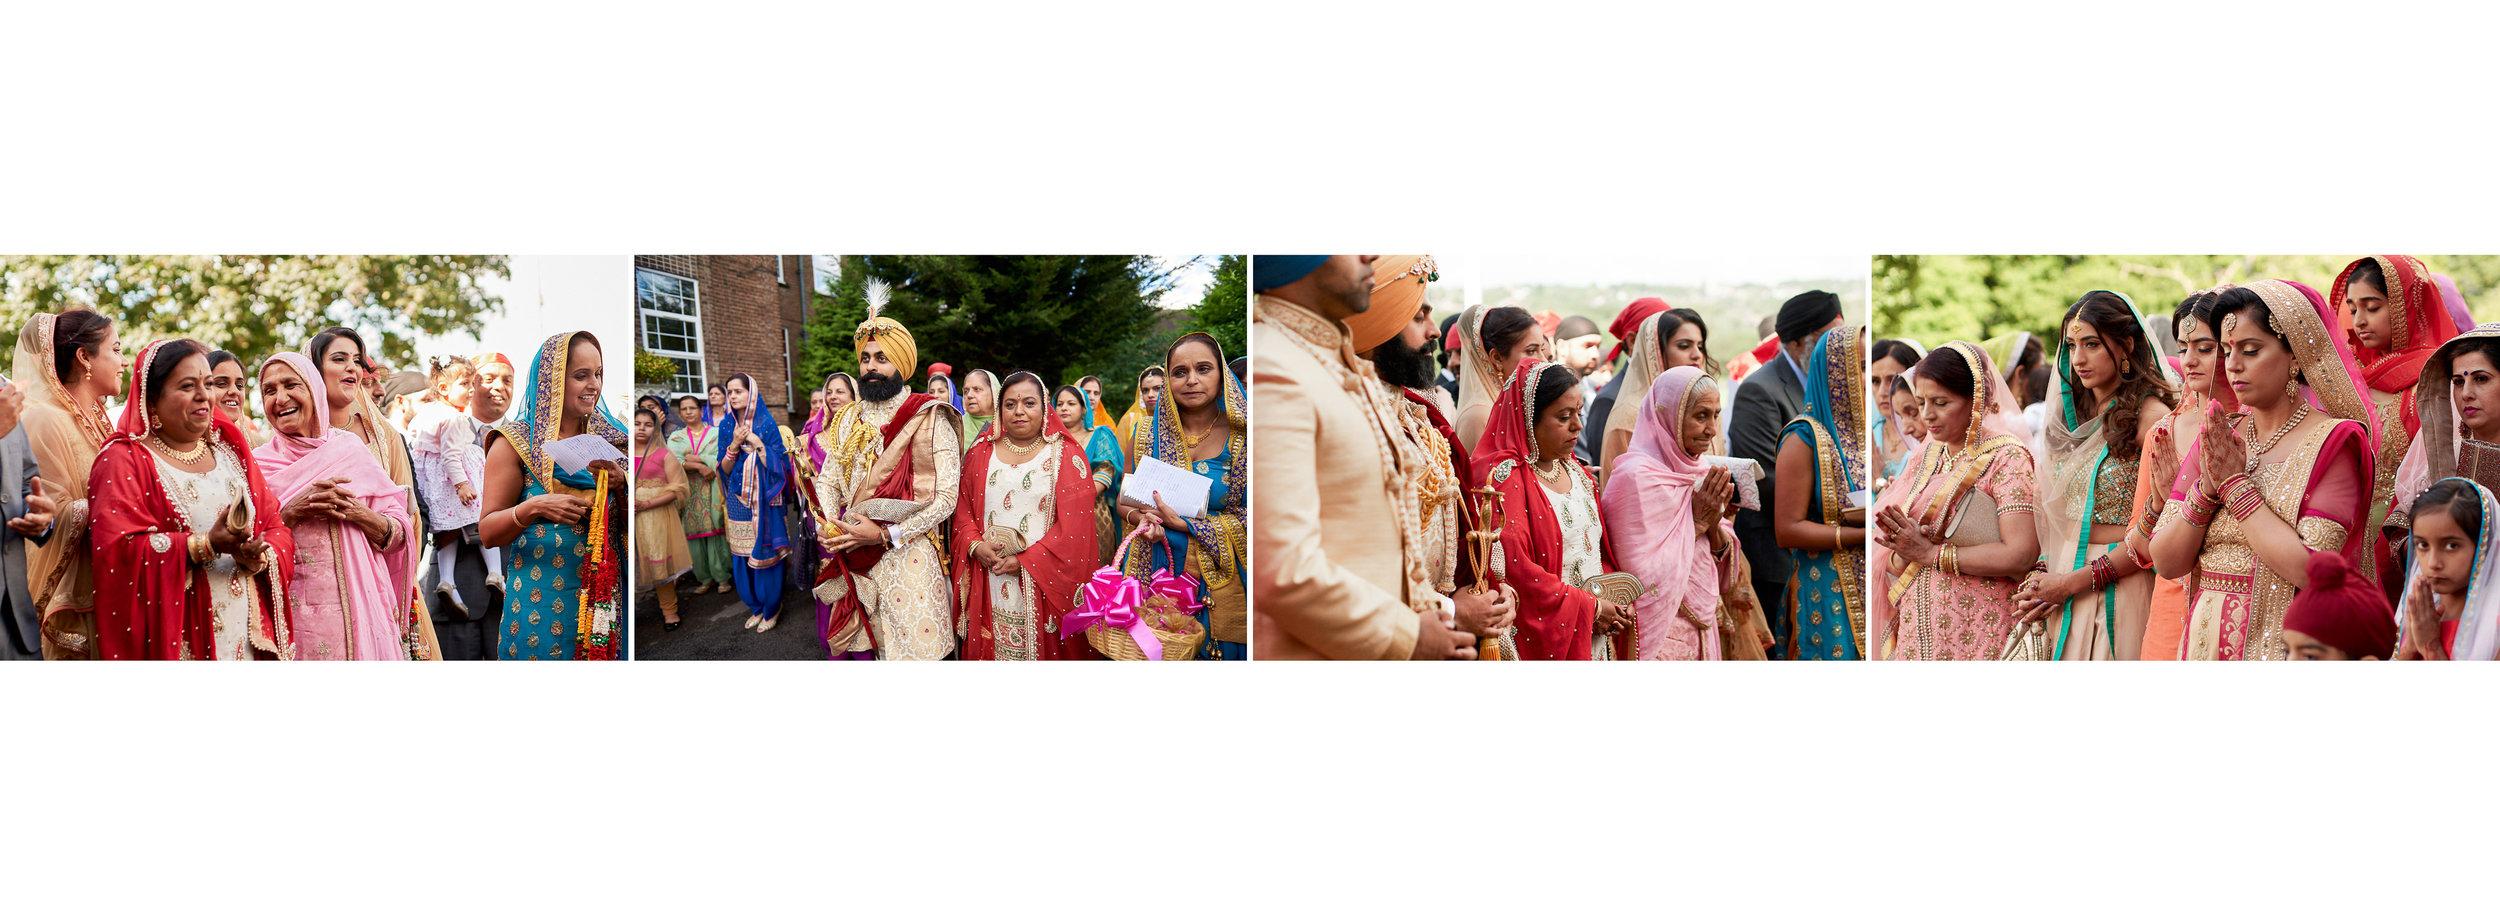 Sikh Wedding - Jaspreet and Indy-22.jpg